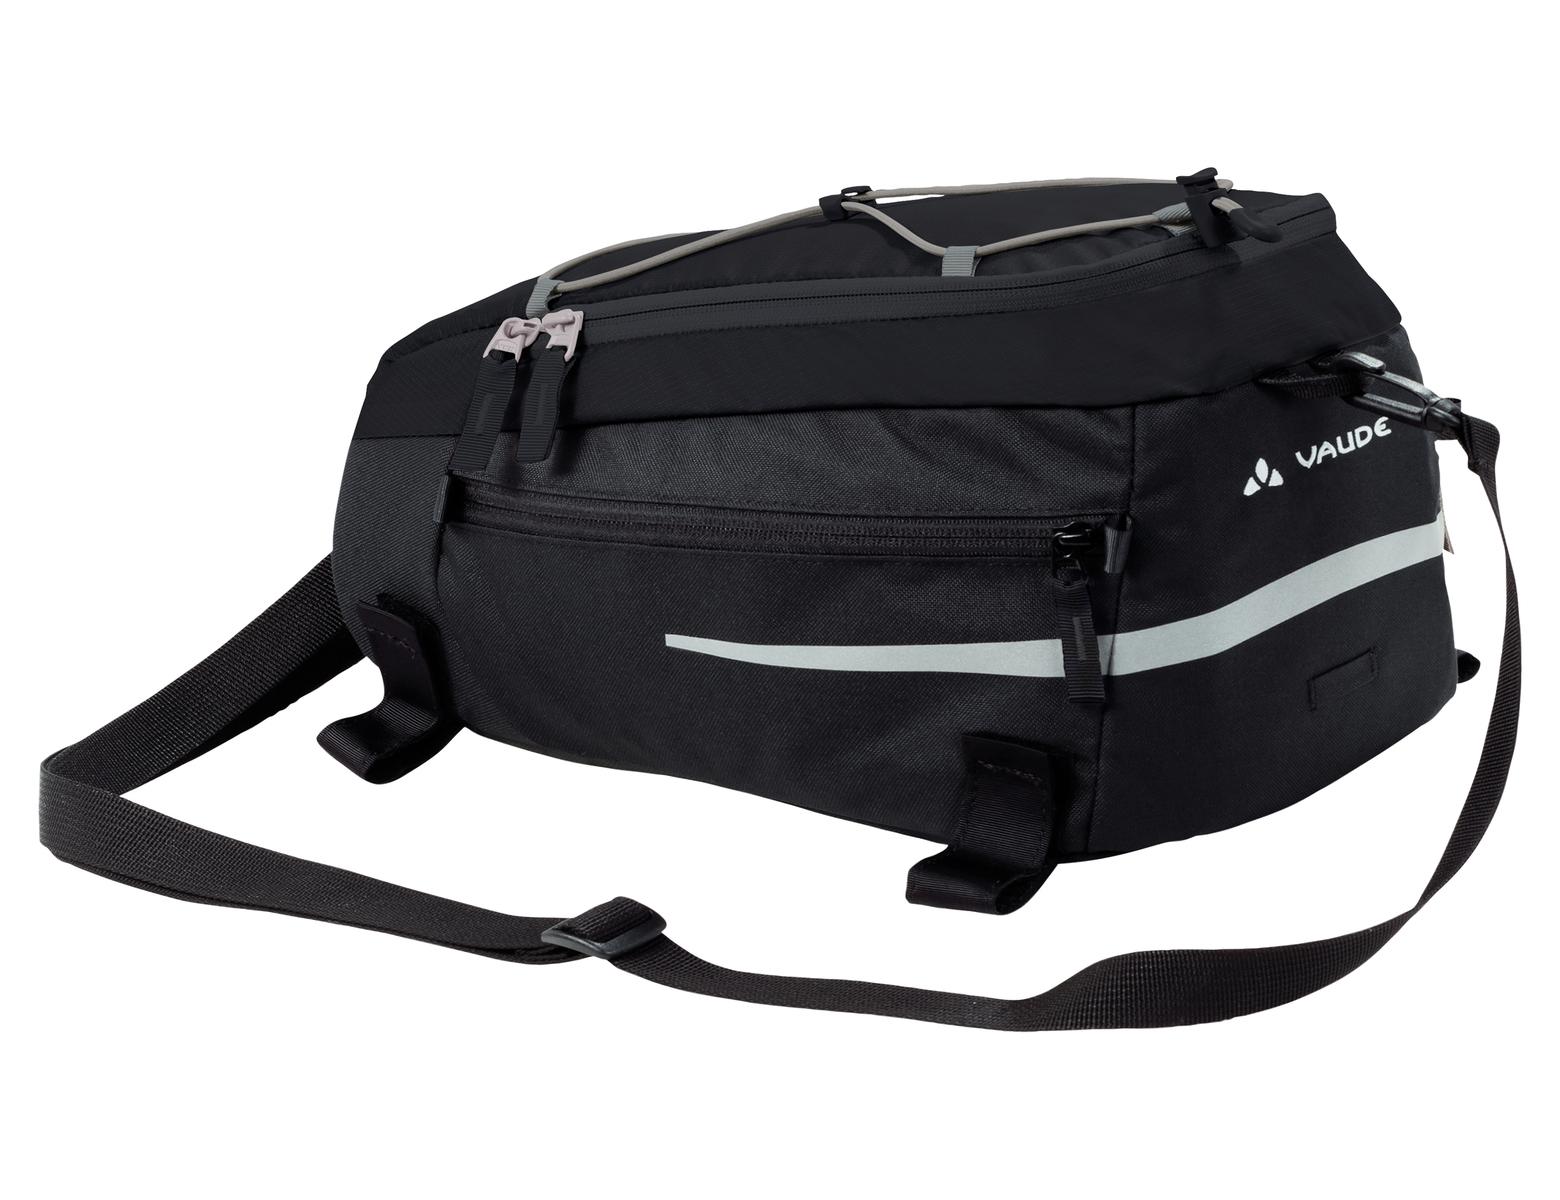 VAUDE Silkroad M black  - 2-Rad-Sport Wehrle